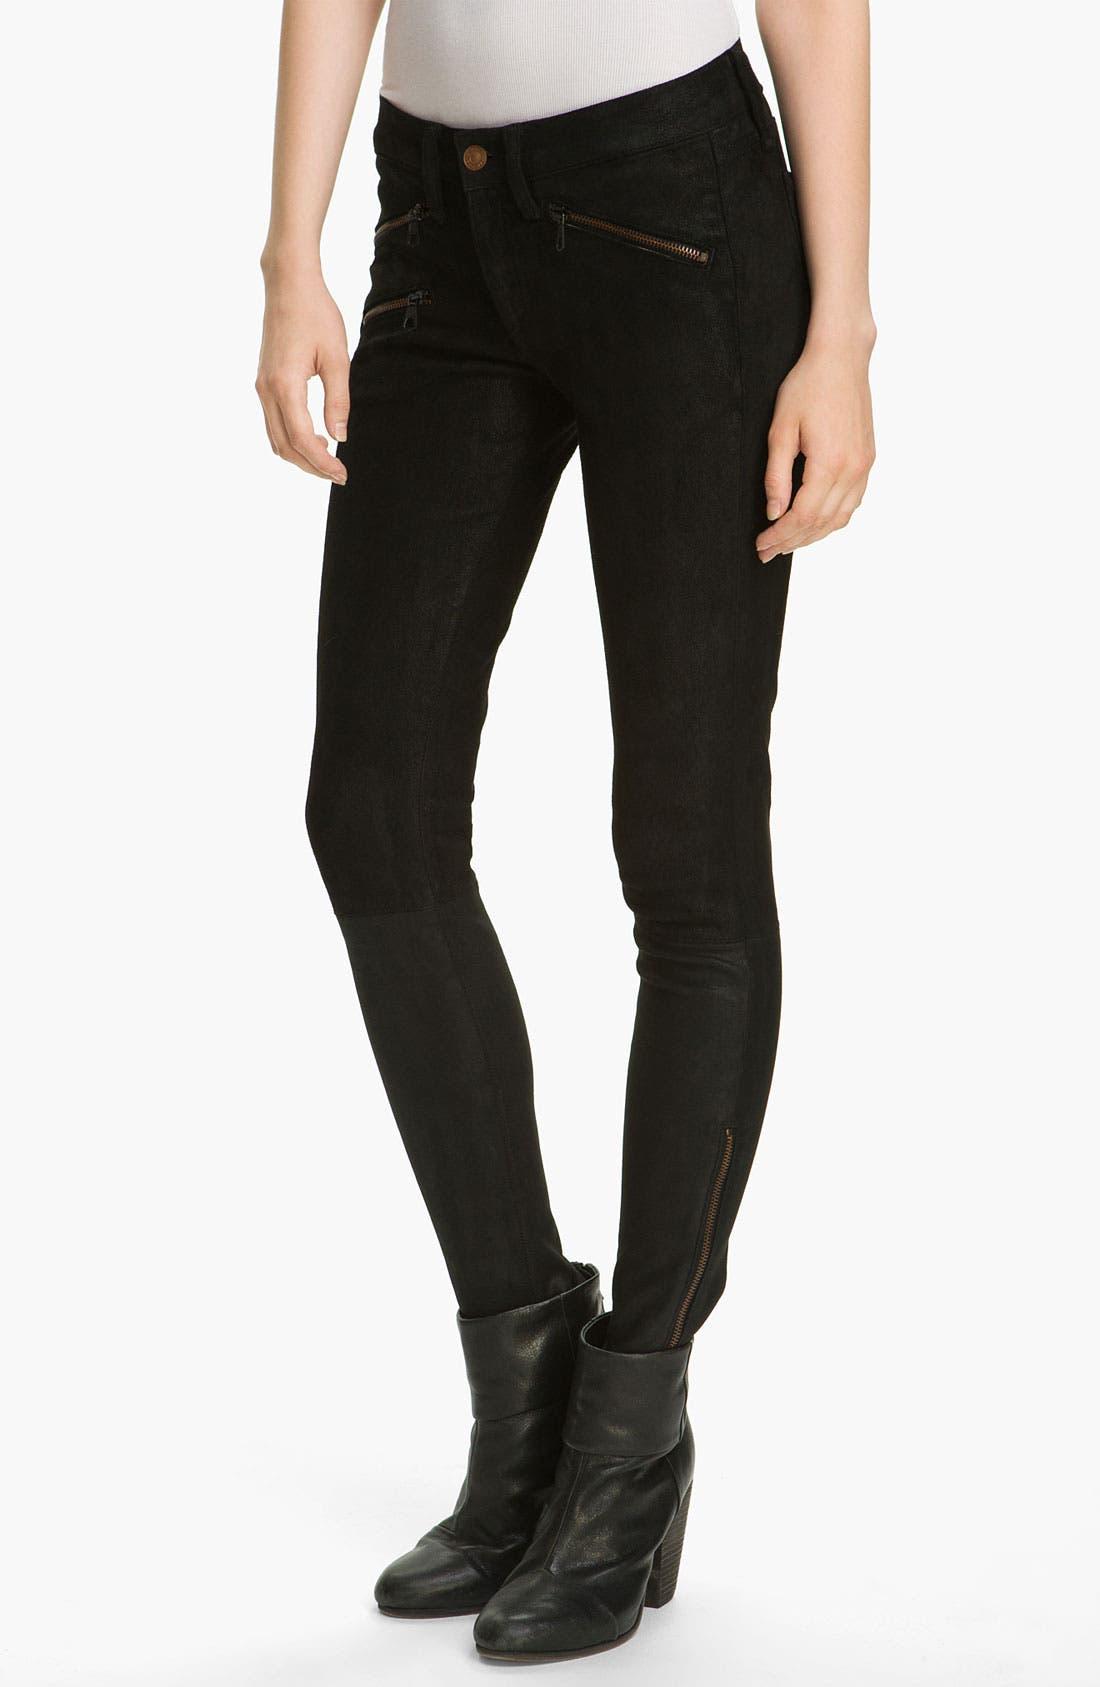 Main Image - rag & bone/JEAN Stretch Leather Leggings